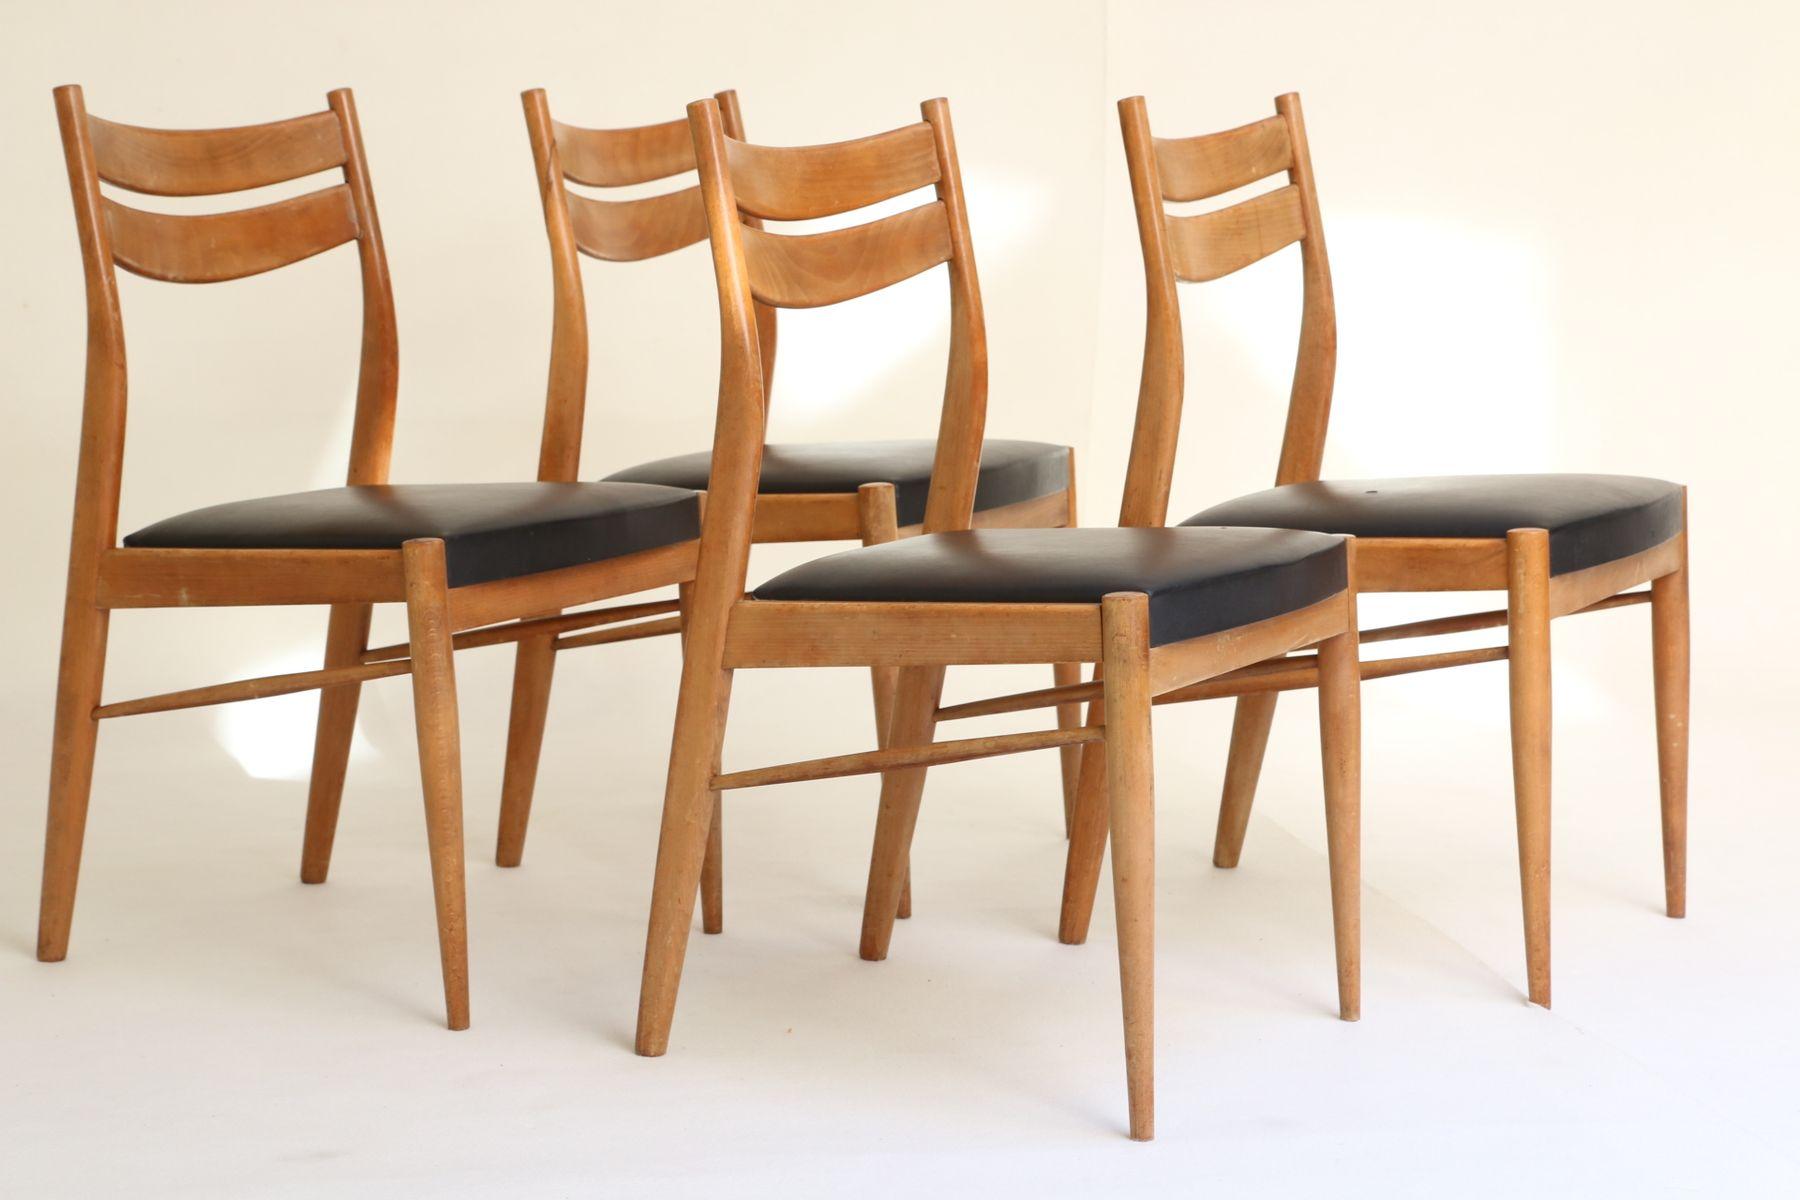 Belgian Vintage Chairs by Oswald Vermaercke for Vform 1960s Set